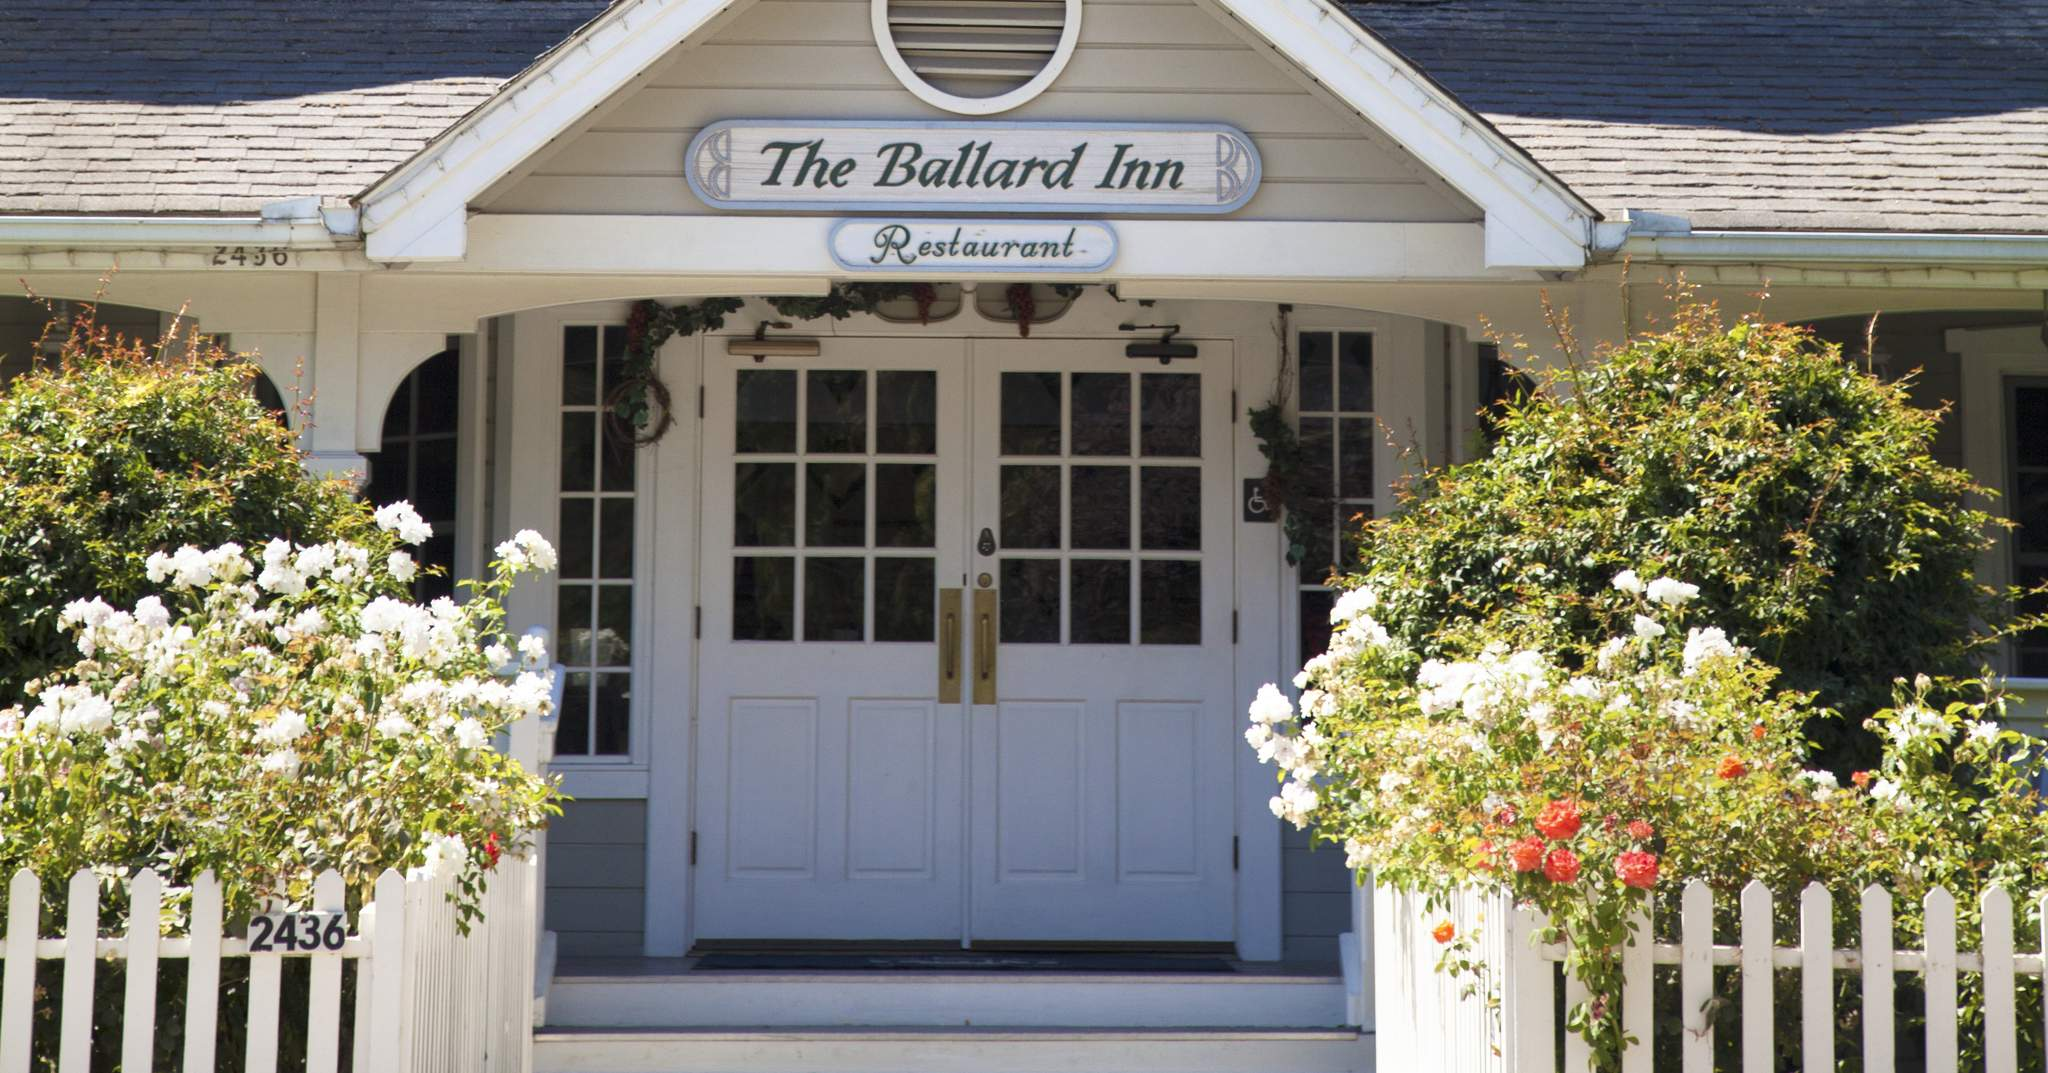 The Ballard Inn & Restaurant